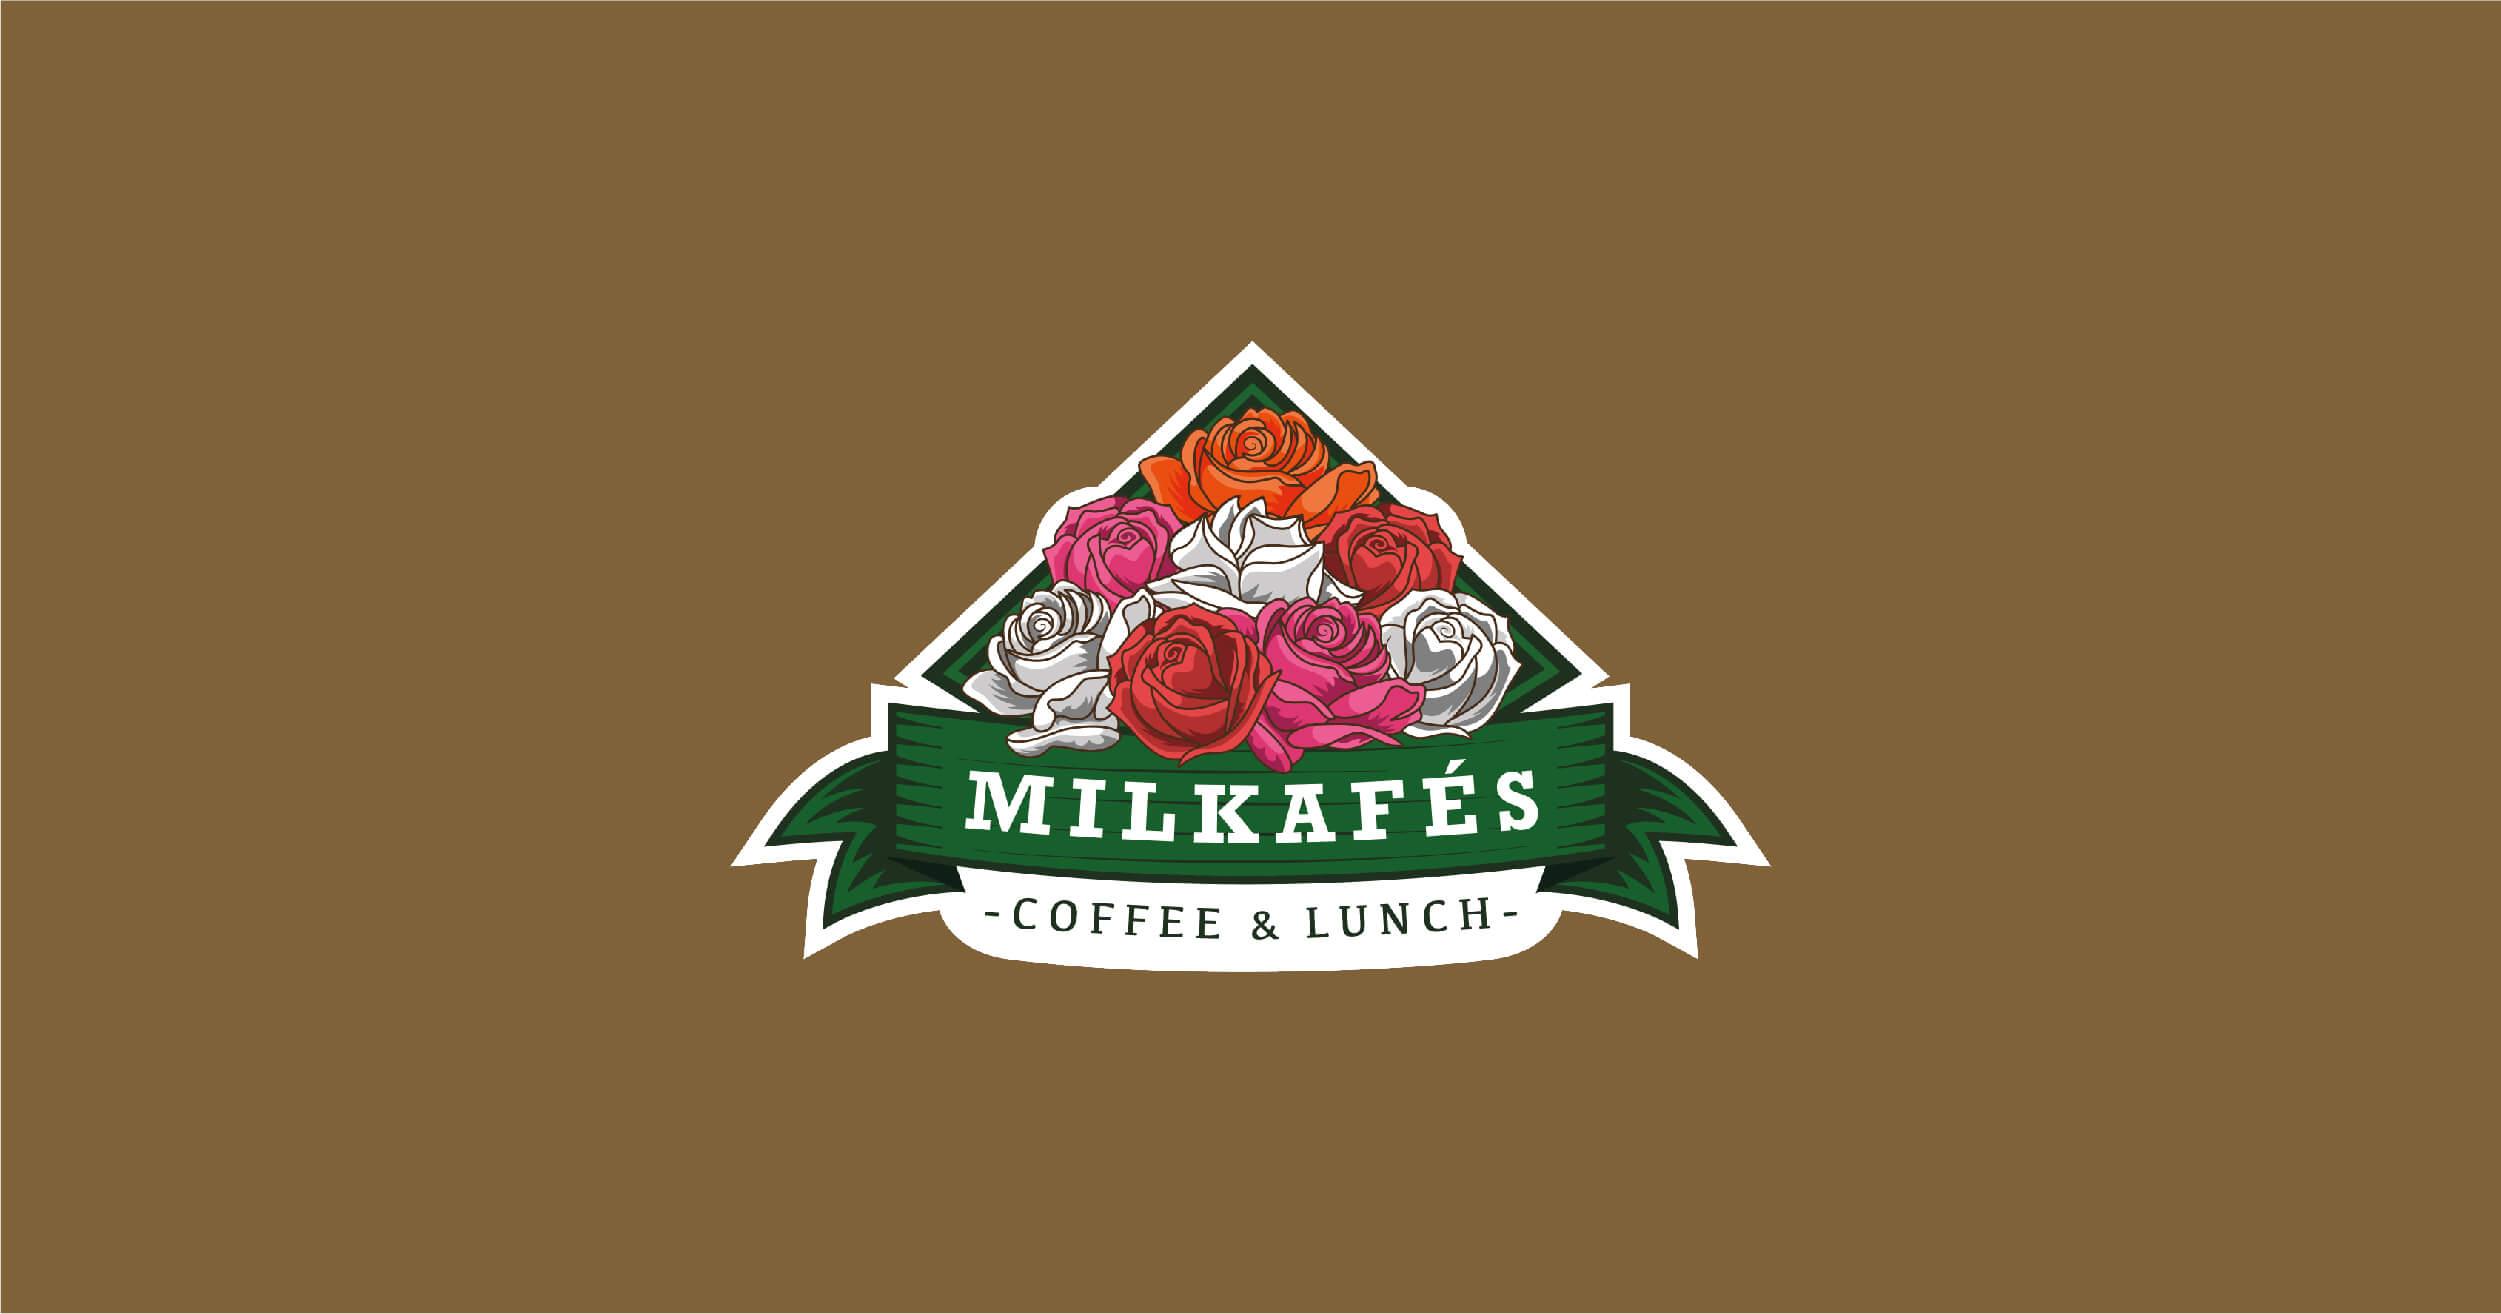 FullFrame-Photomkt-Portafolio-Cover-Milkafés